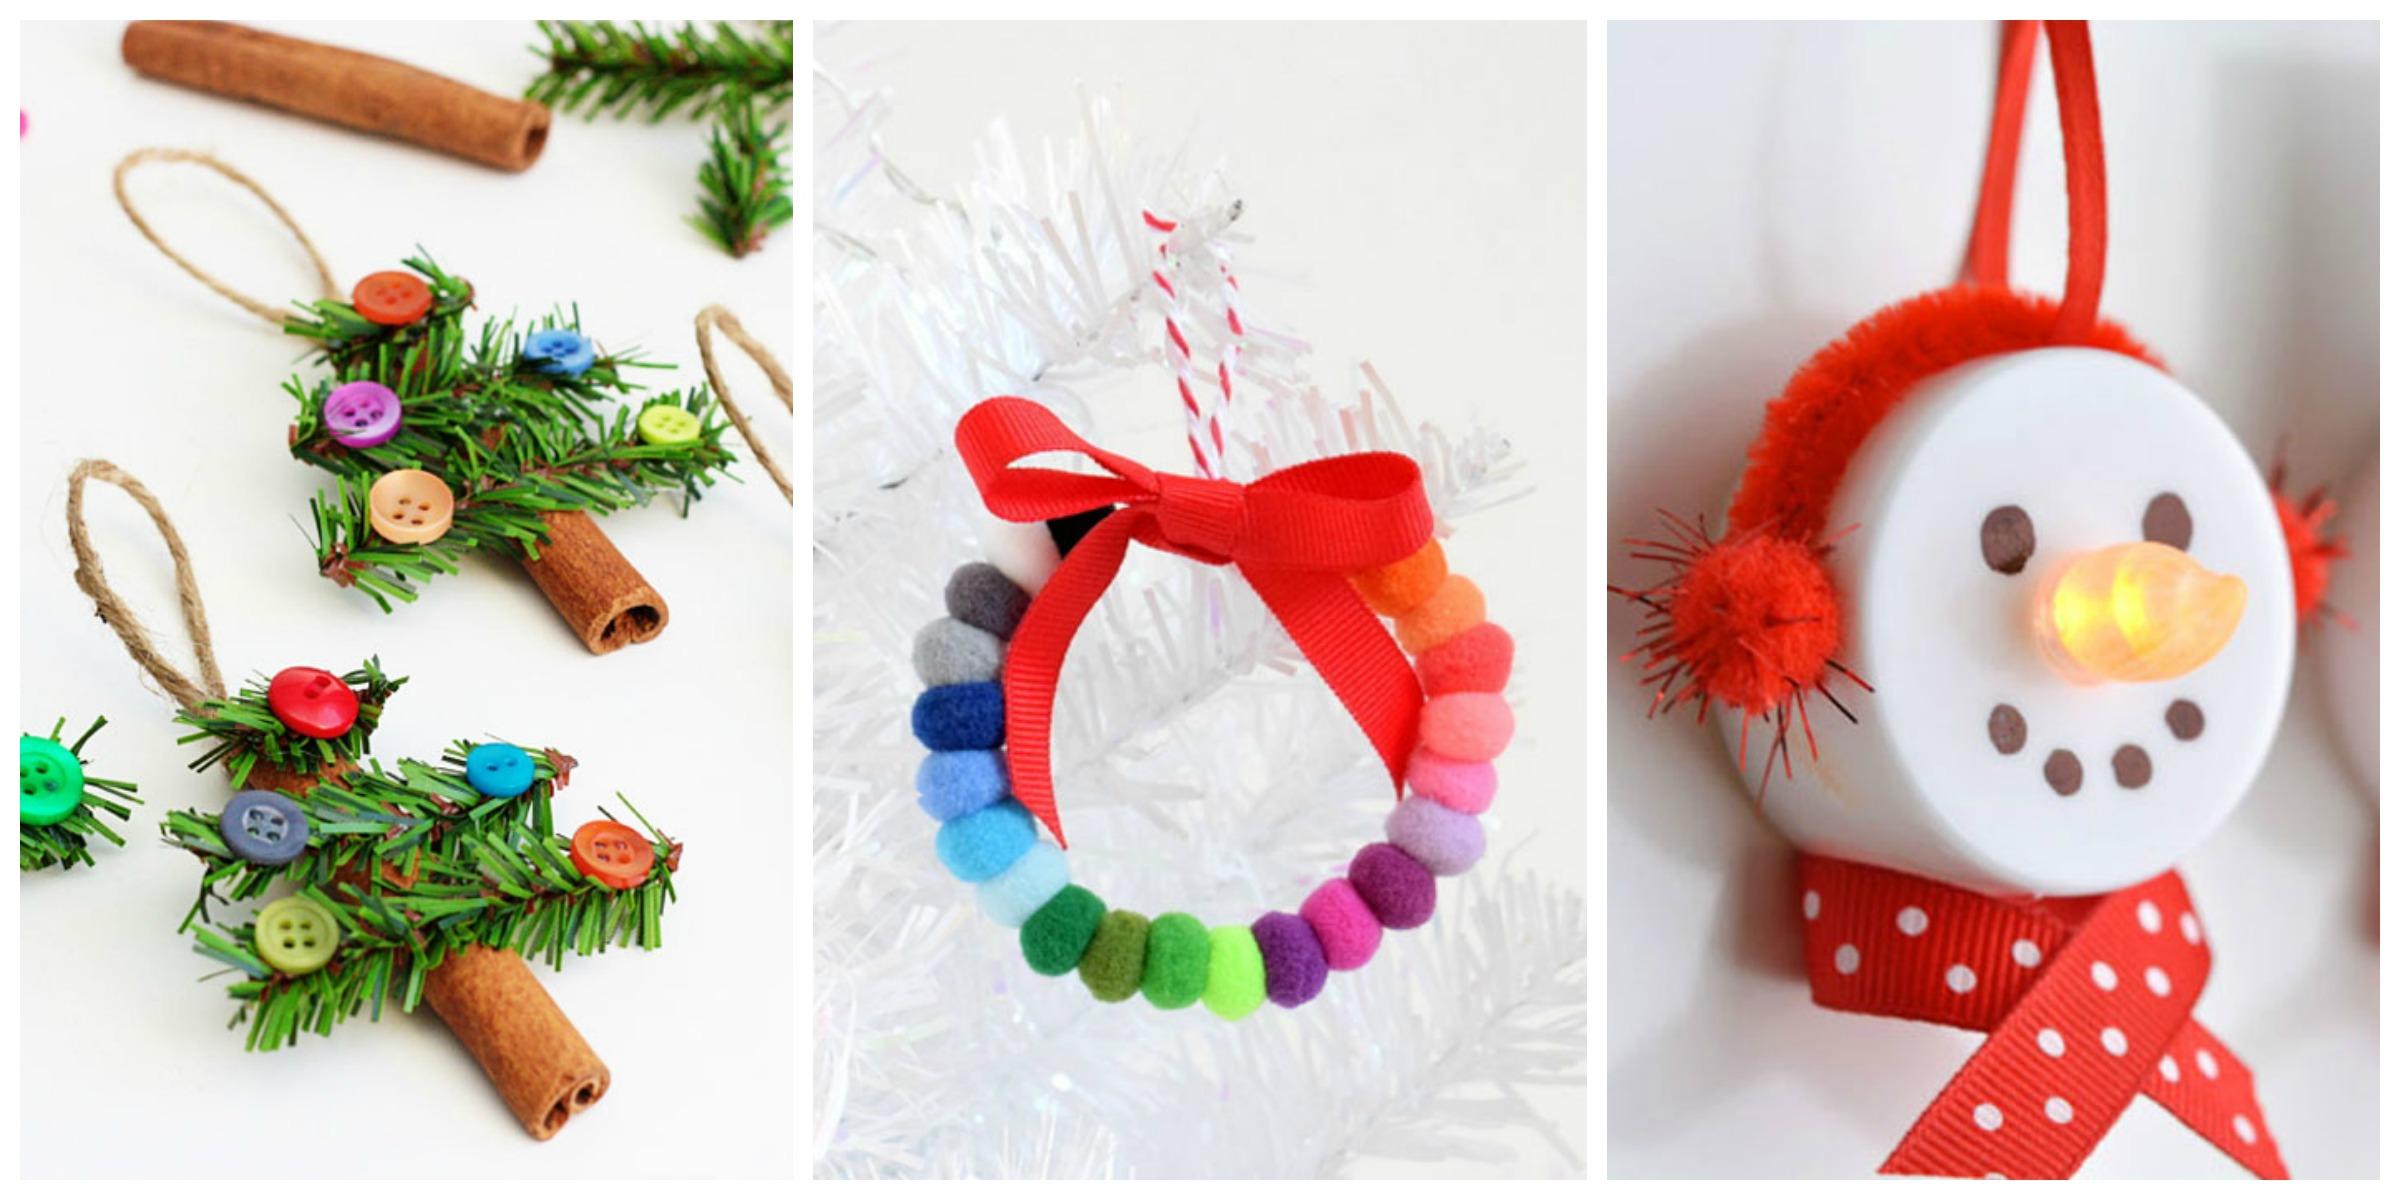 56 Unique DIY Christmas Ornaments